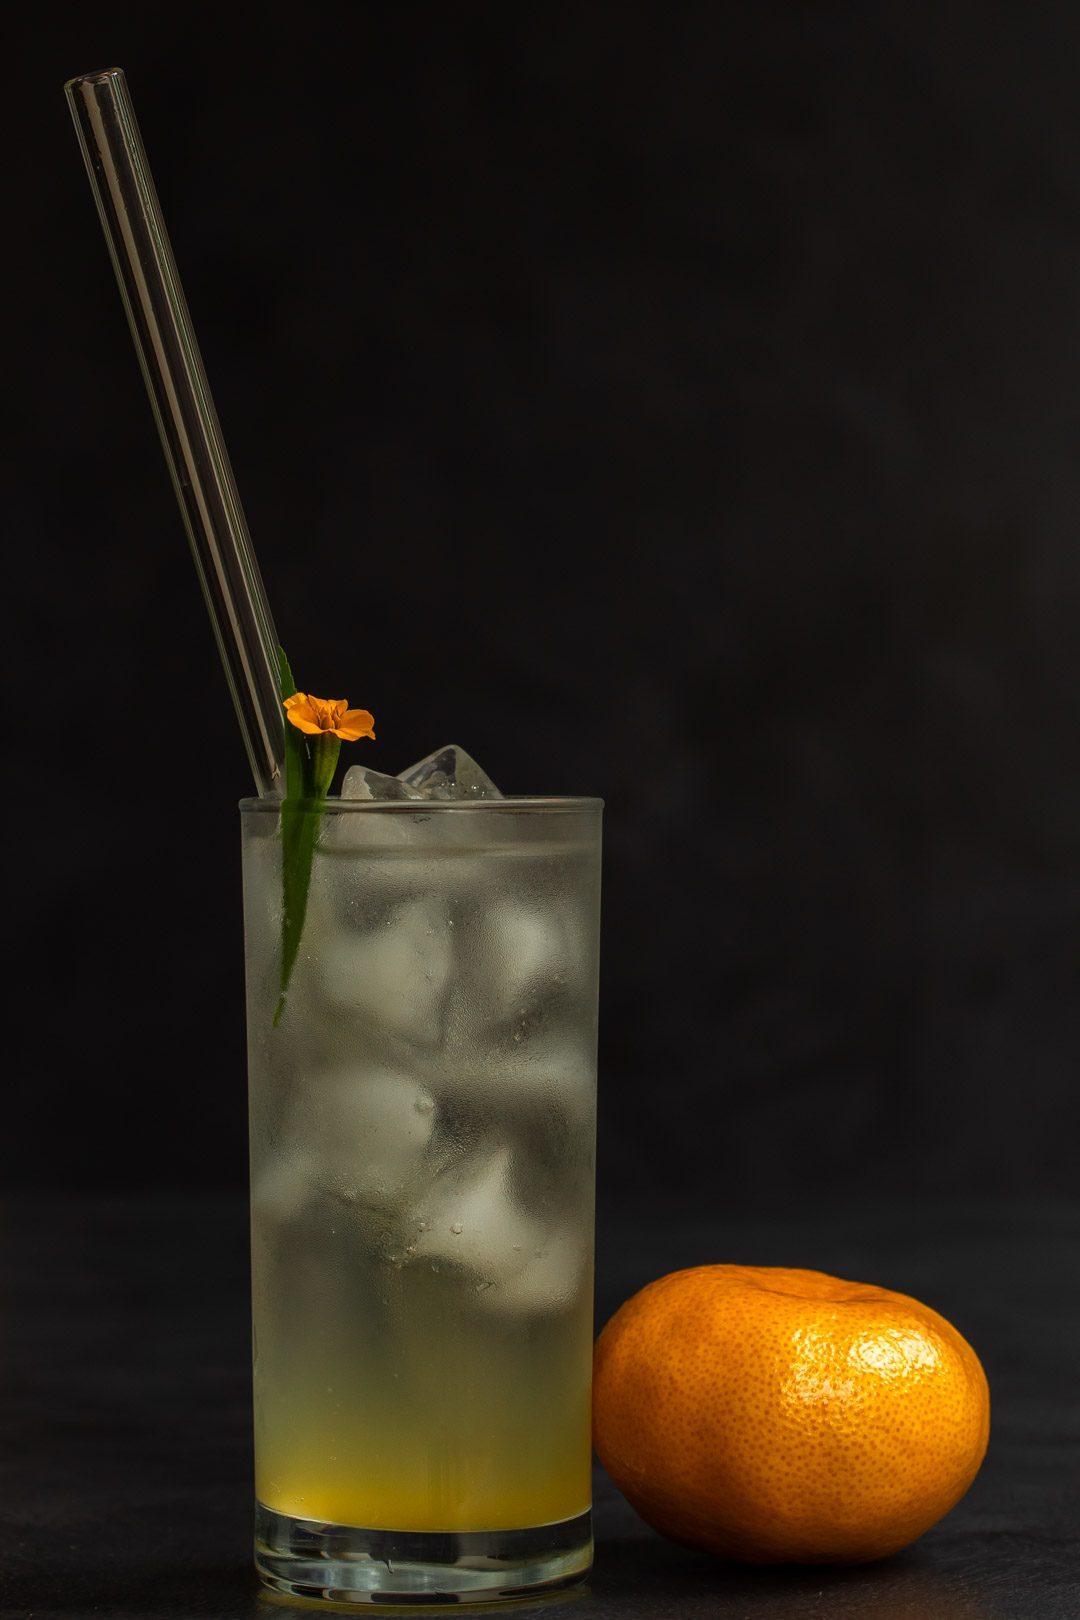 Mandarin tarragon shrub syrup drinking vinegar with mandarin in foreground